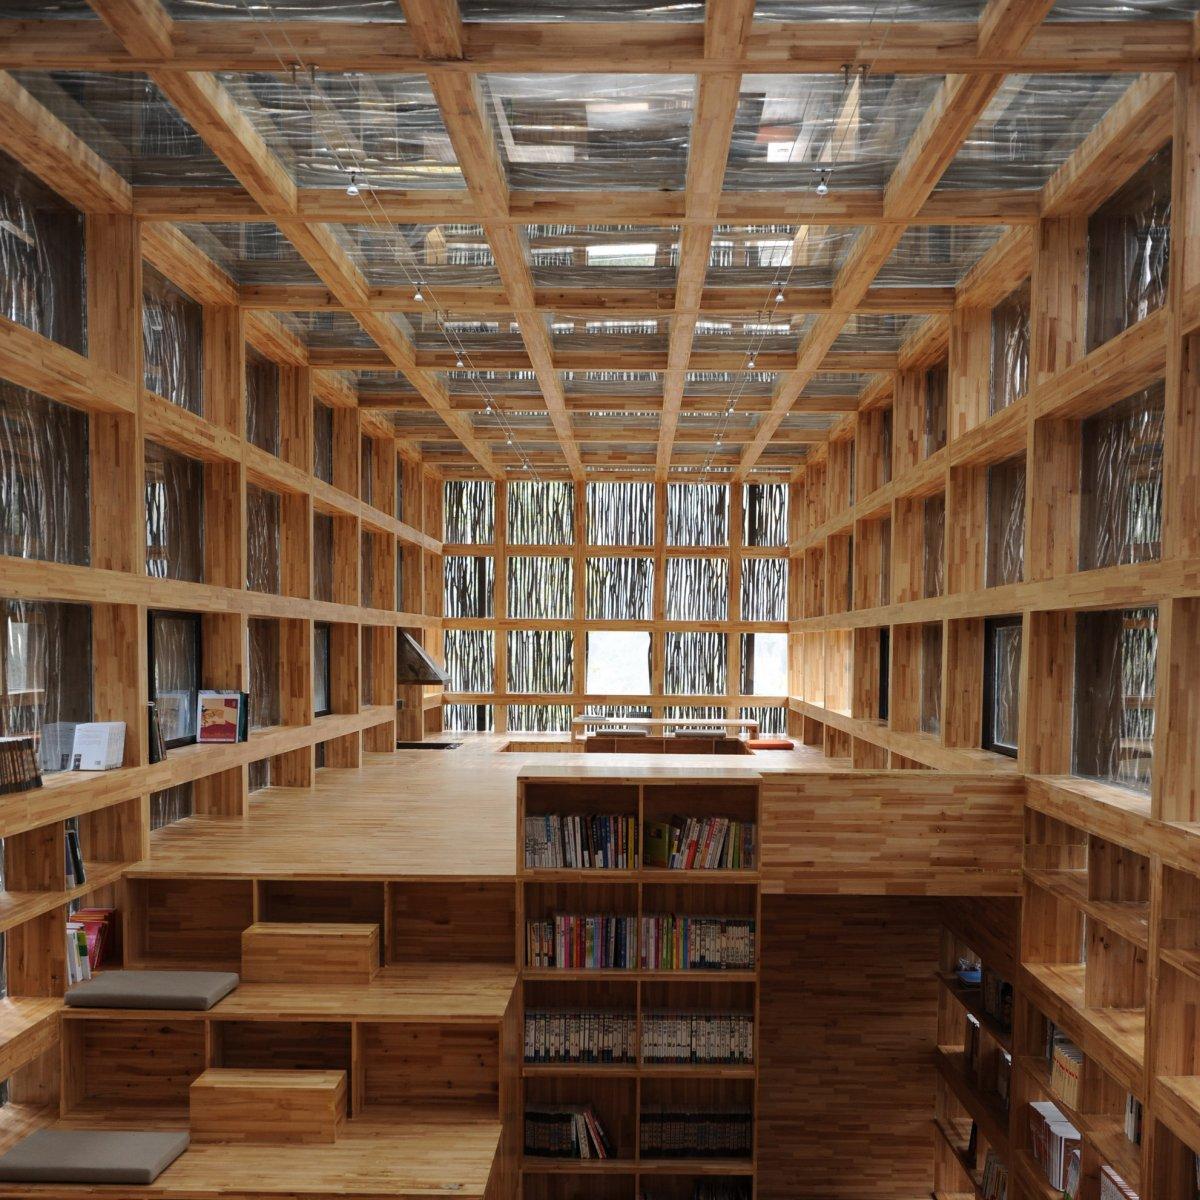 Librairie Liyuan par les ateliers Li Xiaodong